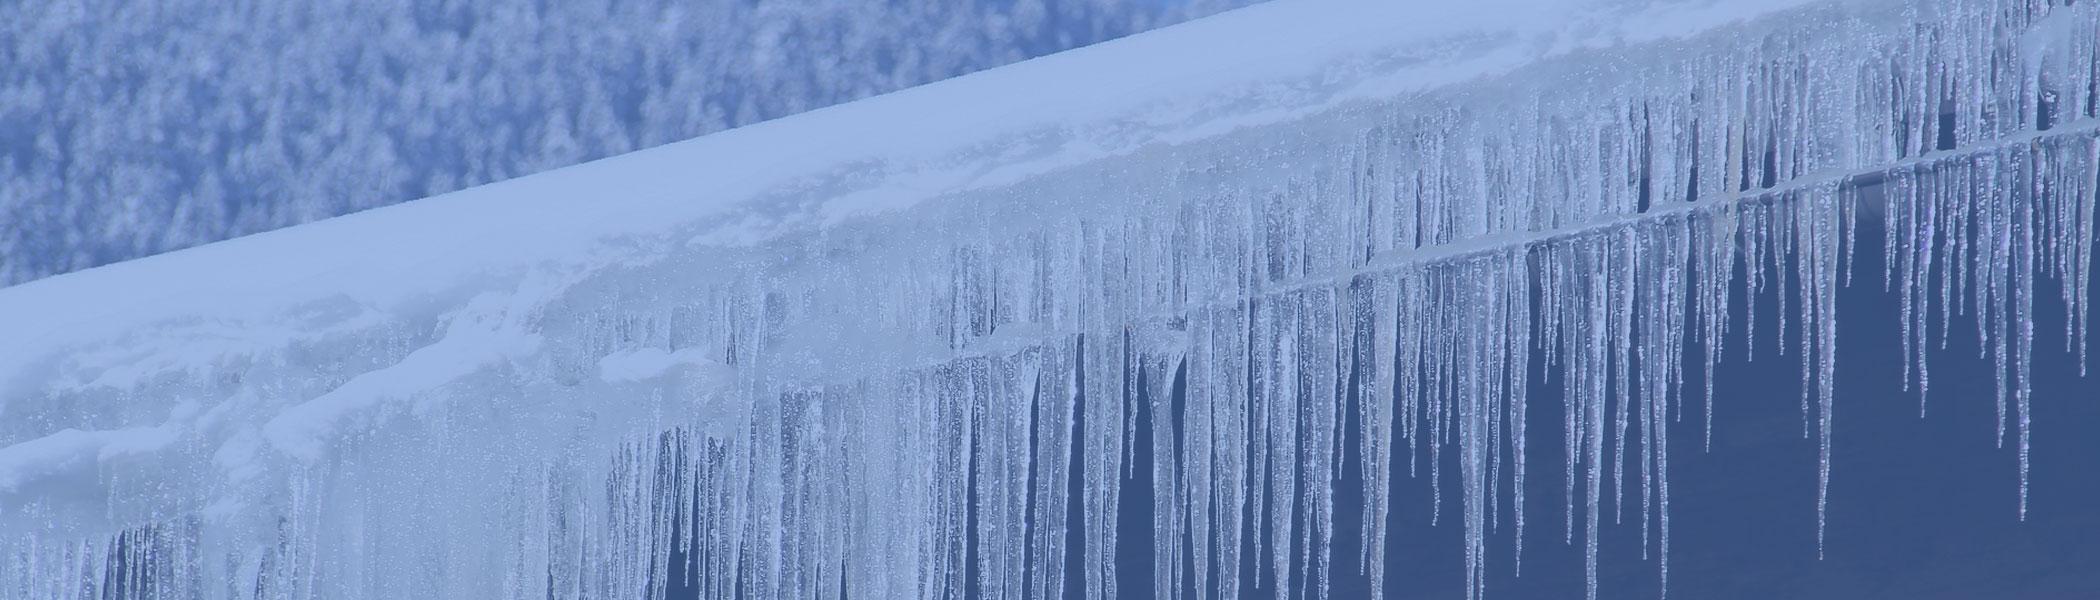 ice dams and ice damage